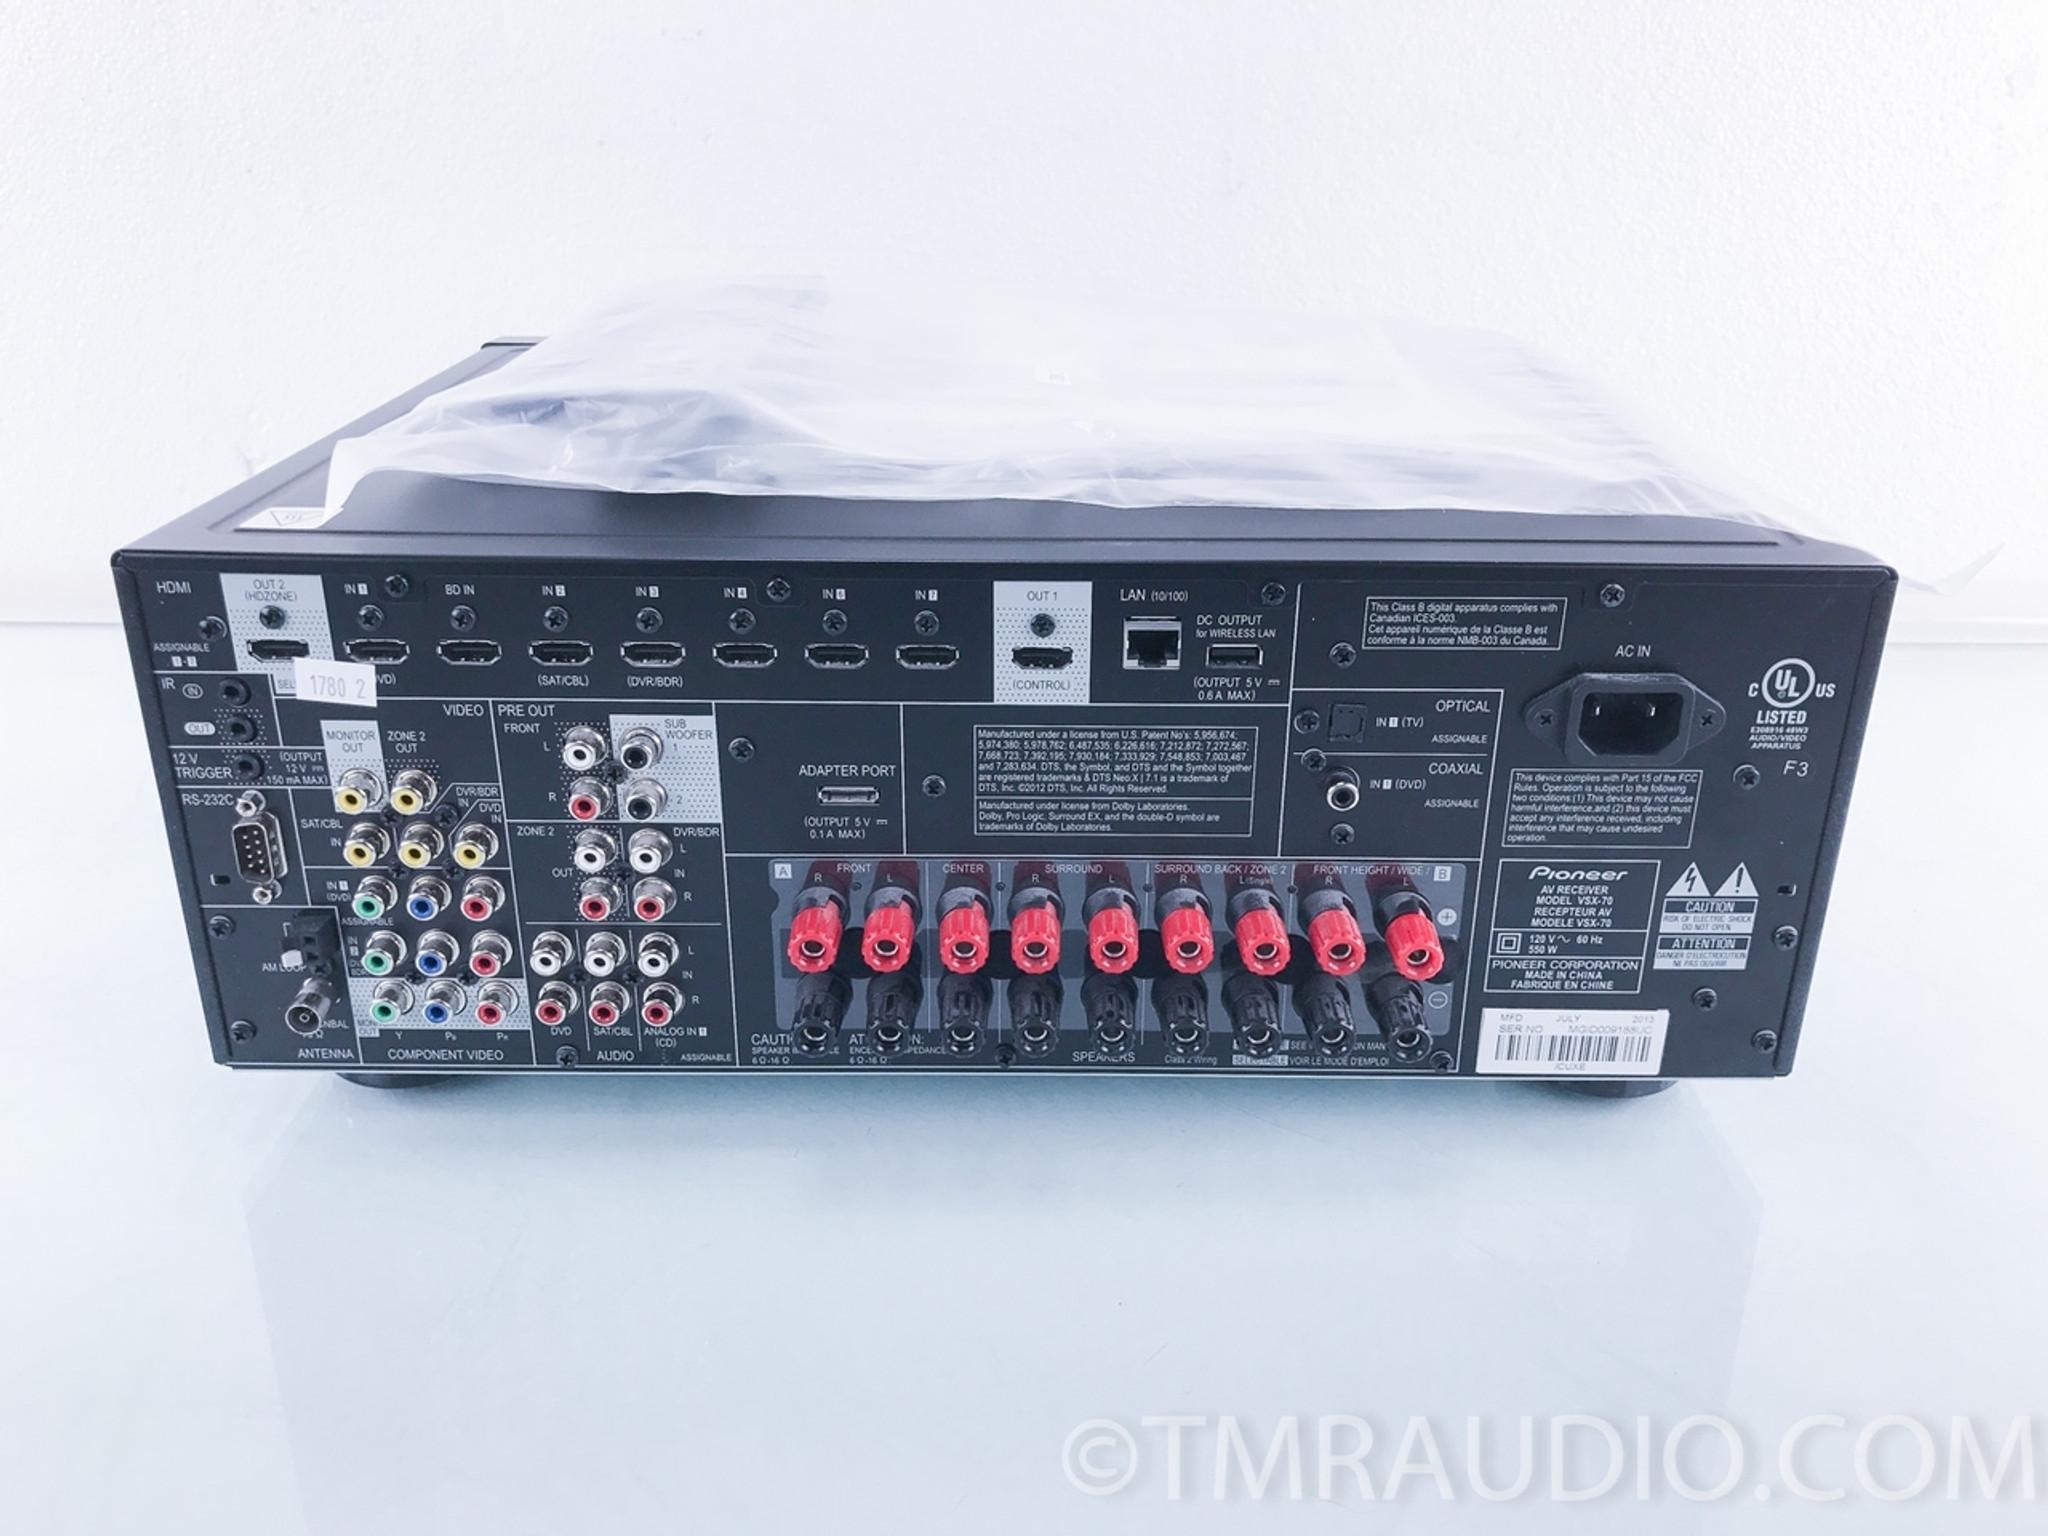 pioneer elite vsx 70 home theater receiver the music room rh tmraudio com Pioneer Receiver VSX -43 Pioneer Receiver VSX -43